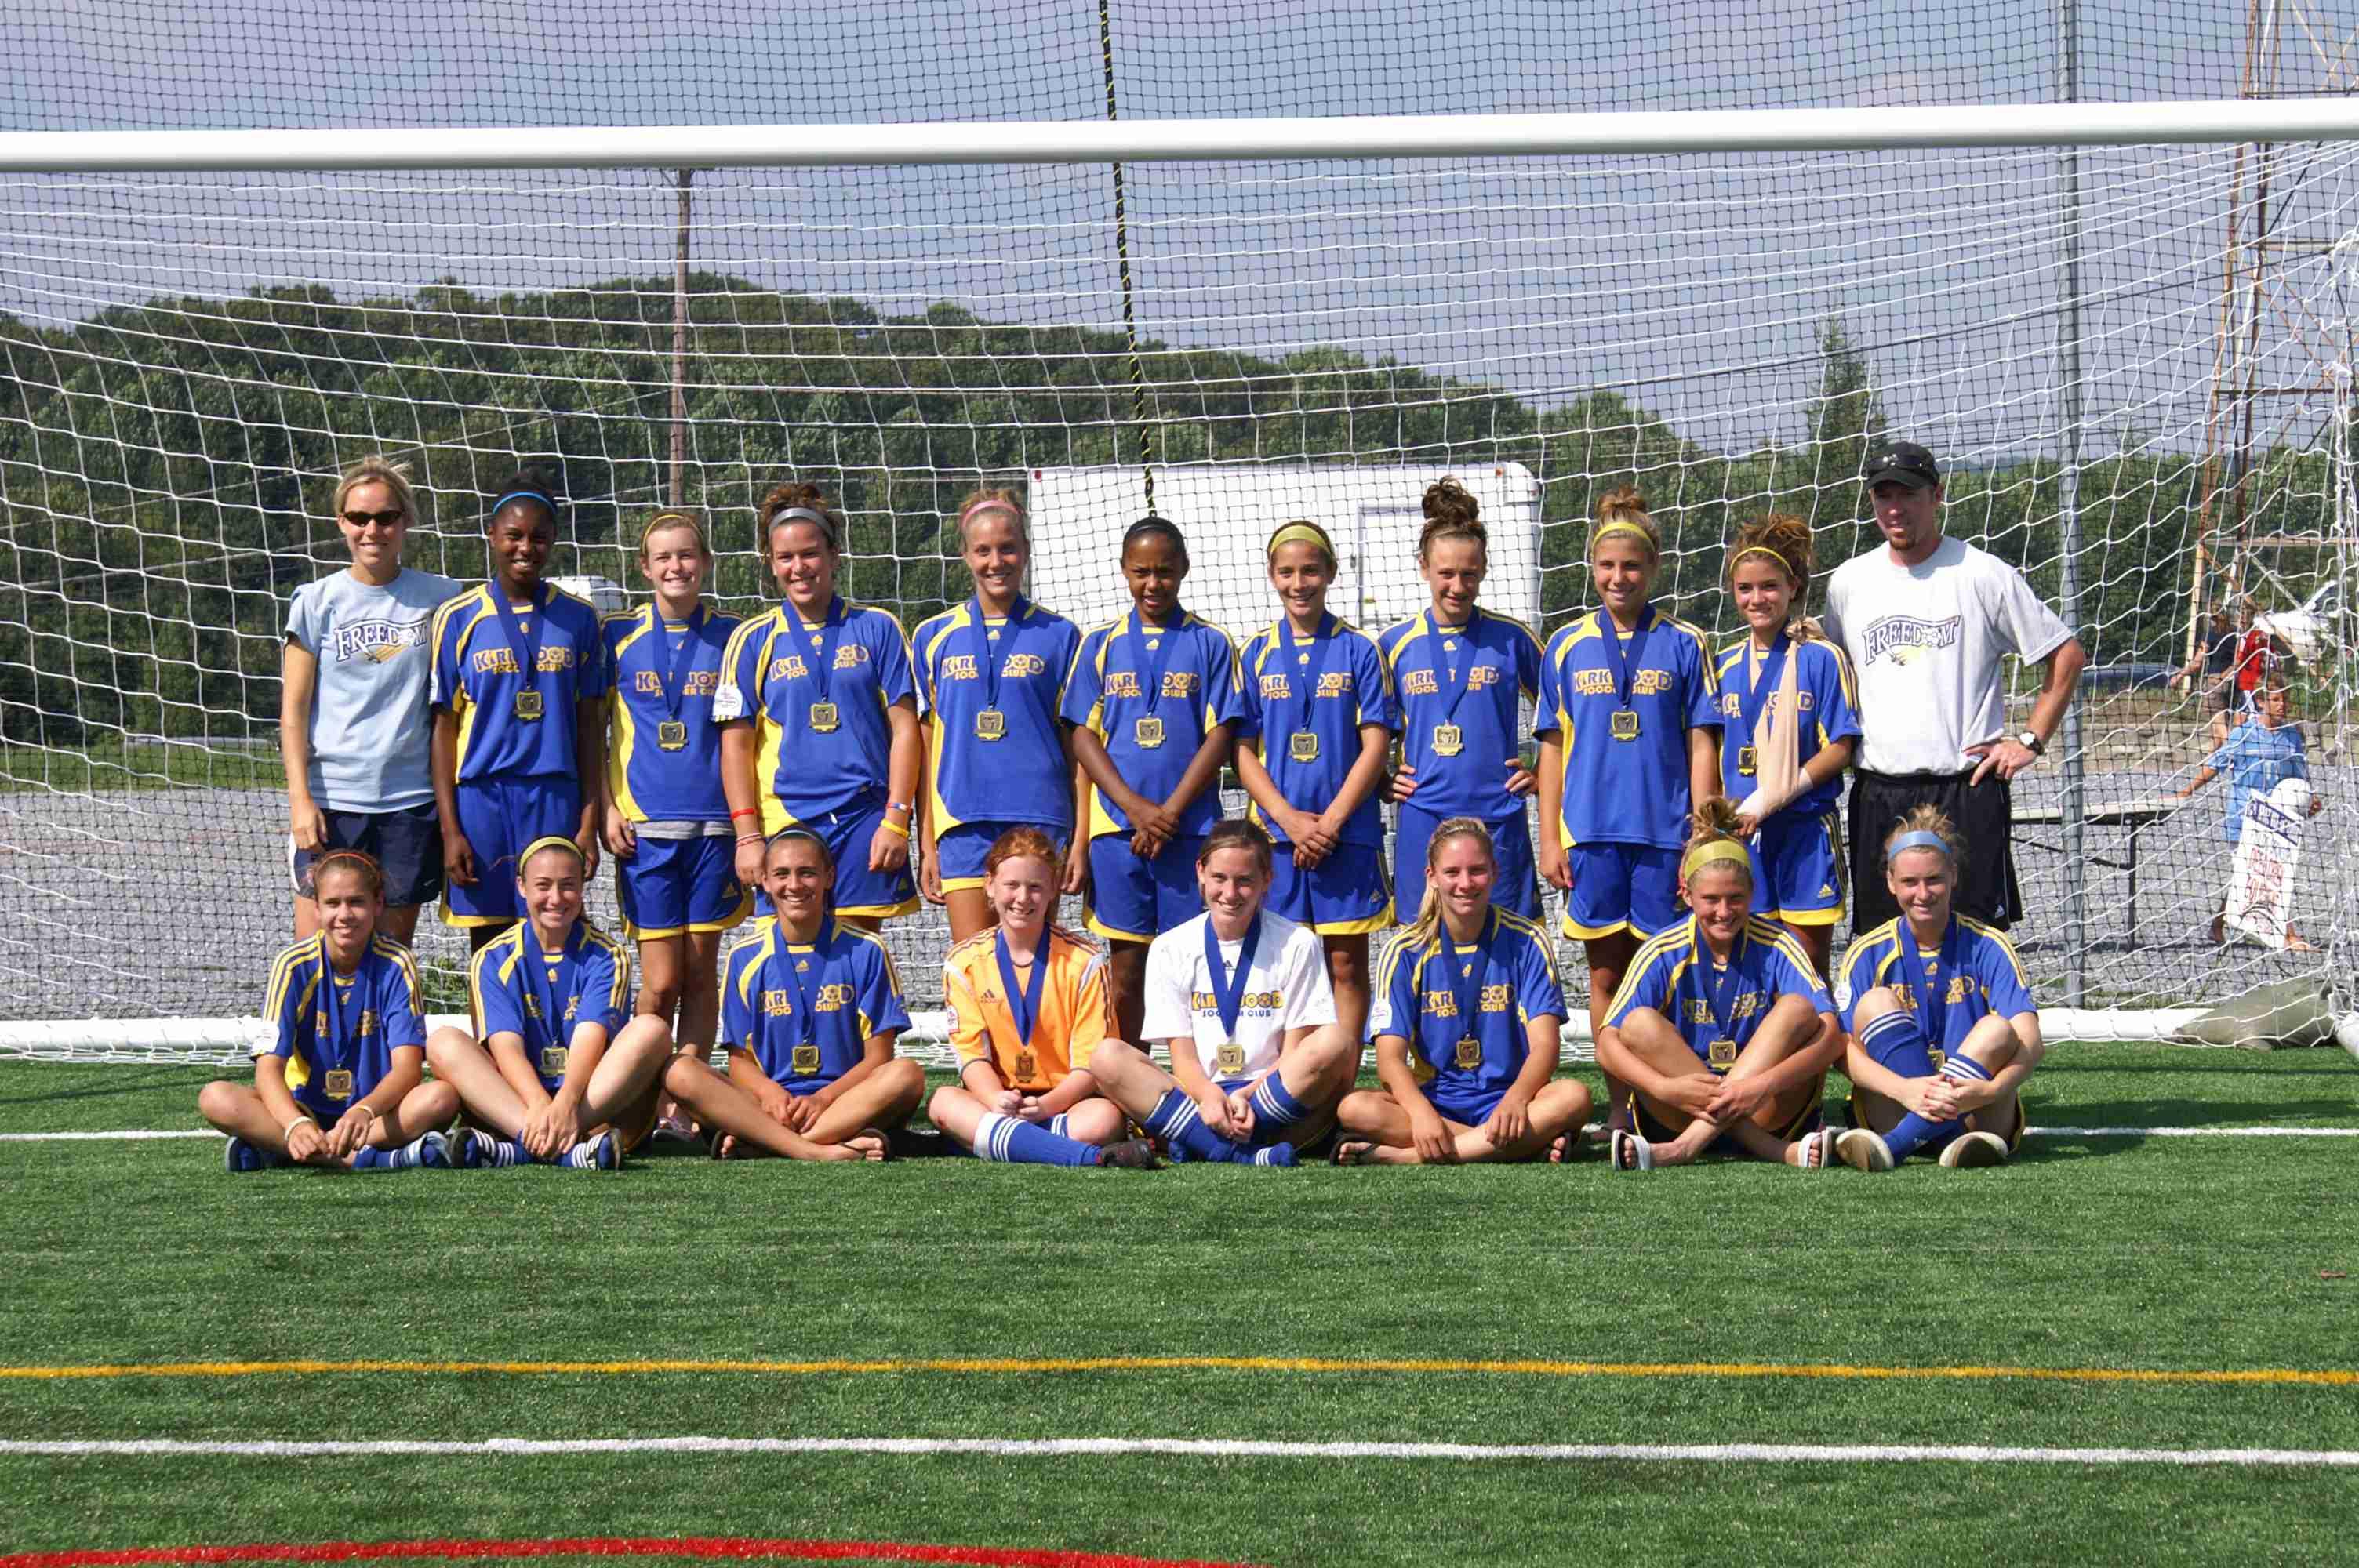 2008 Spirit Kick-off Champions